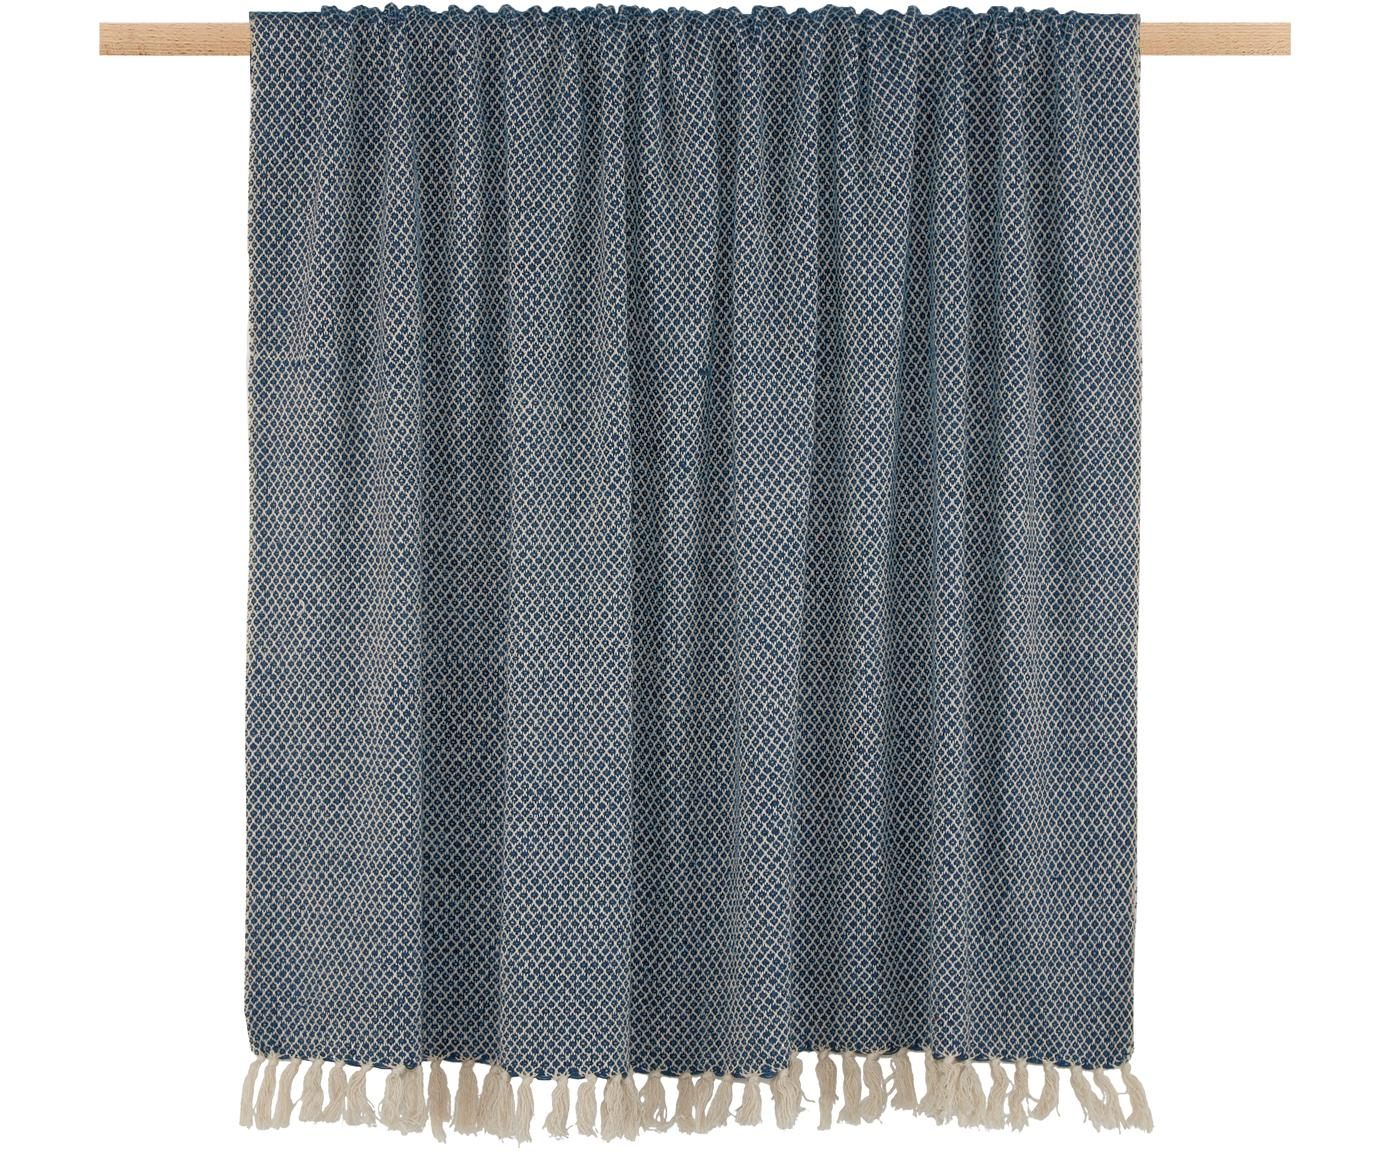 Plaid Thea, Blu marino scuro, beige chiaro, Larg. 130 x Lung. 160 cm